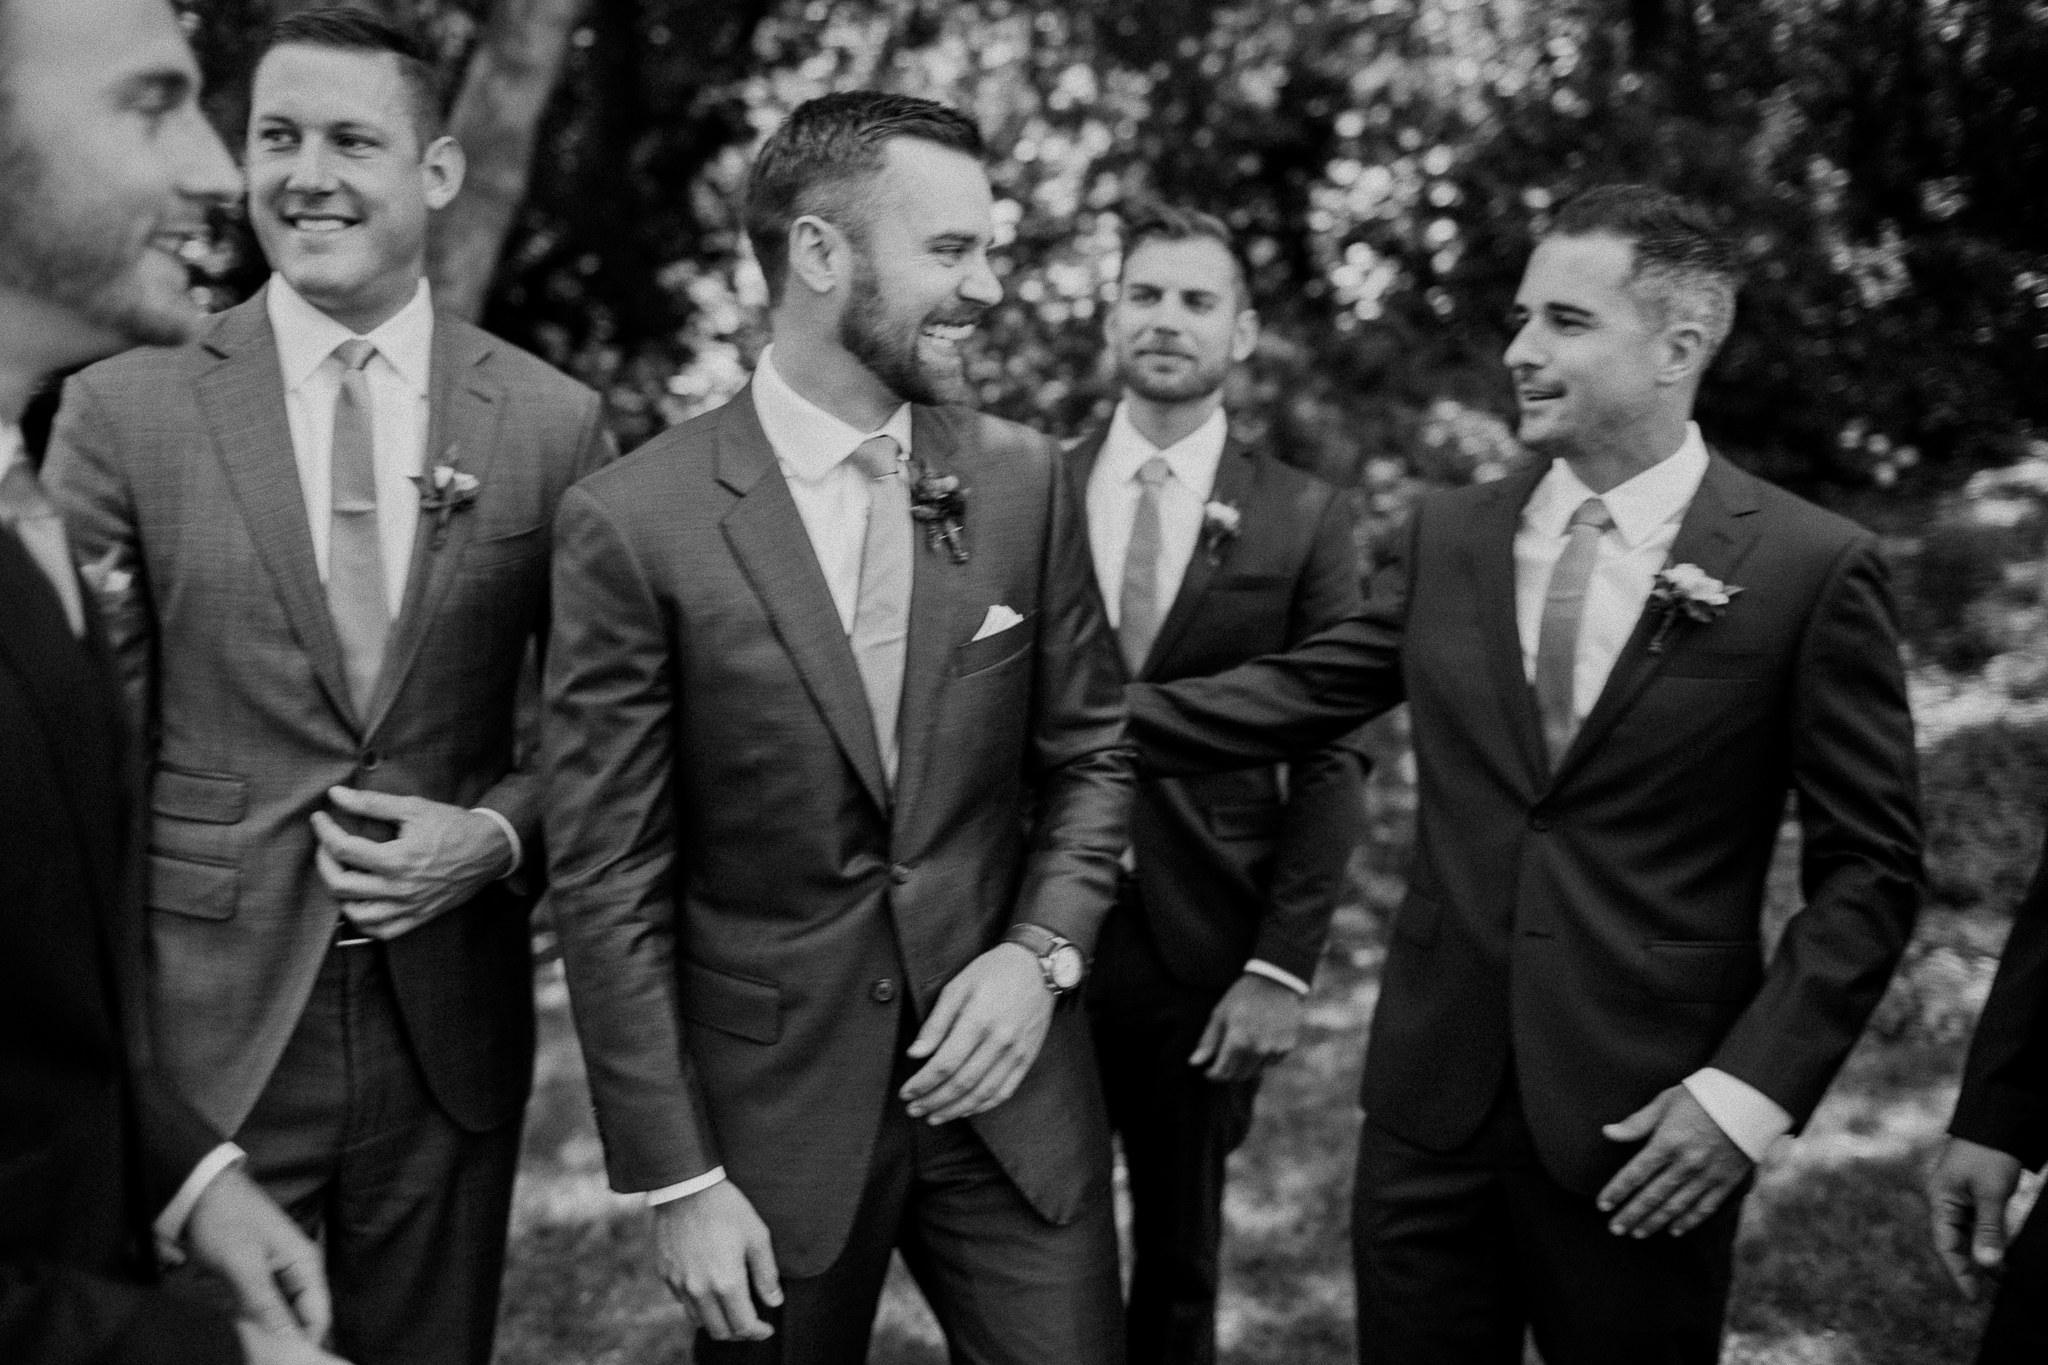 california_wedding_photography_madrona_manor_gretchen_gause_healdsburg_photo_-1.jpg